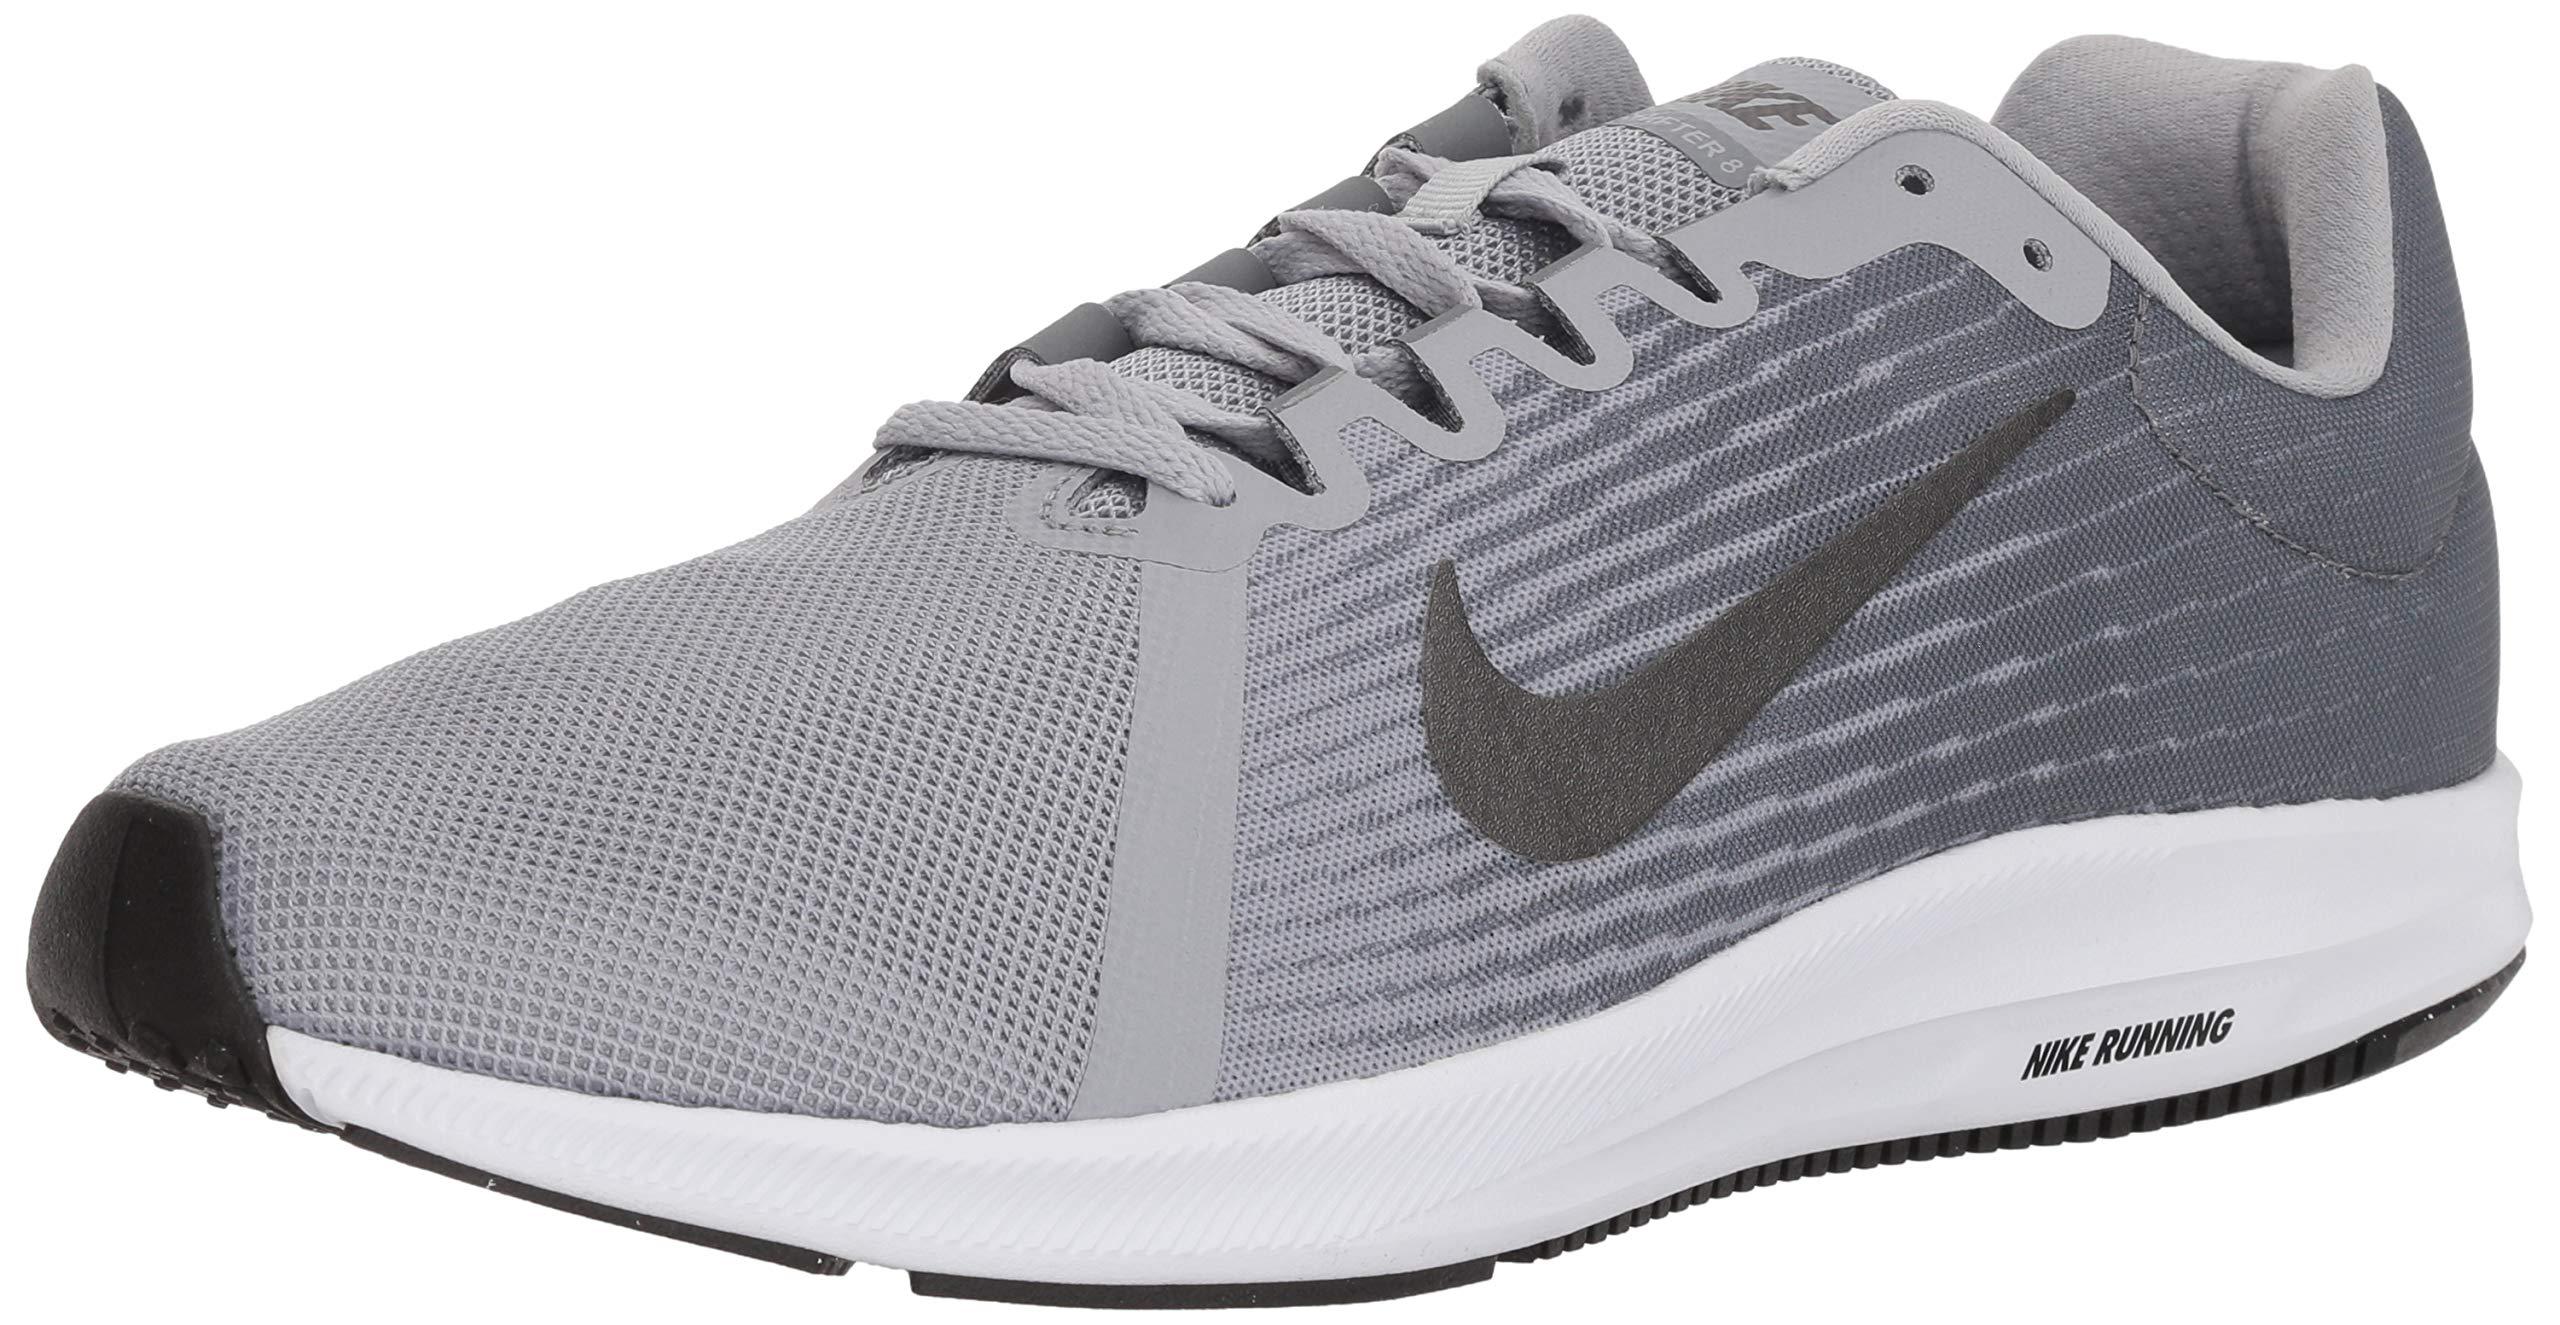 size 40 37615 d5e58 Galleon - Nike Men s Downshifter 8 Running Shoe, Wolf Metallic Dark Cool  Grey, 9 Regular US